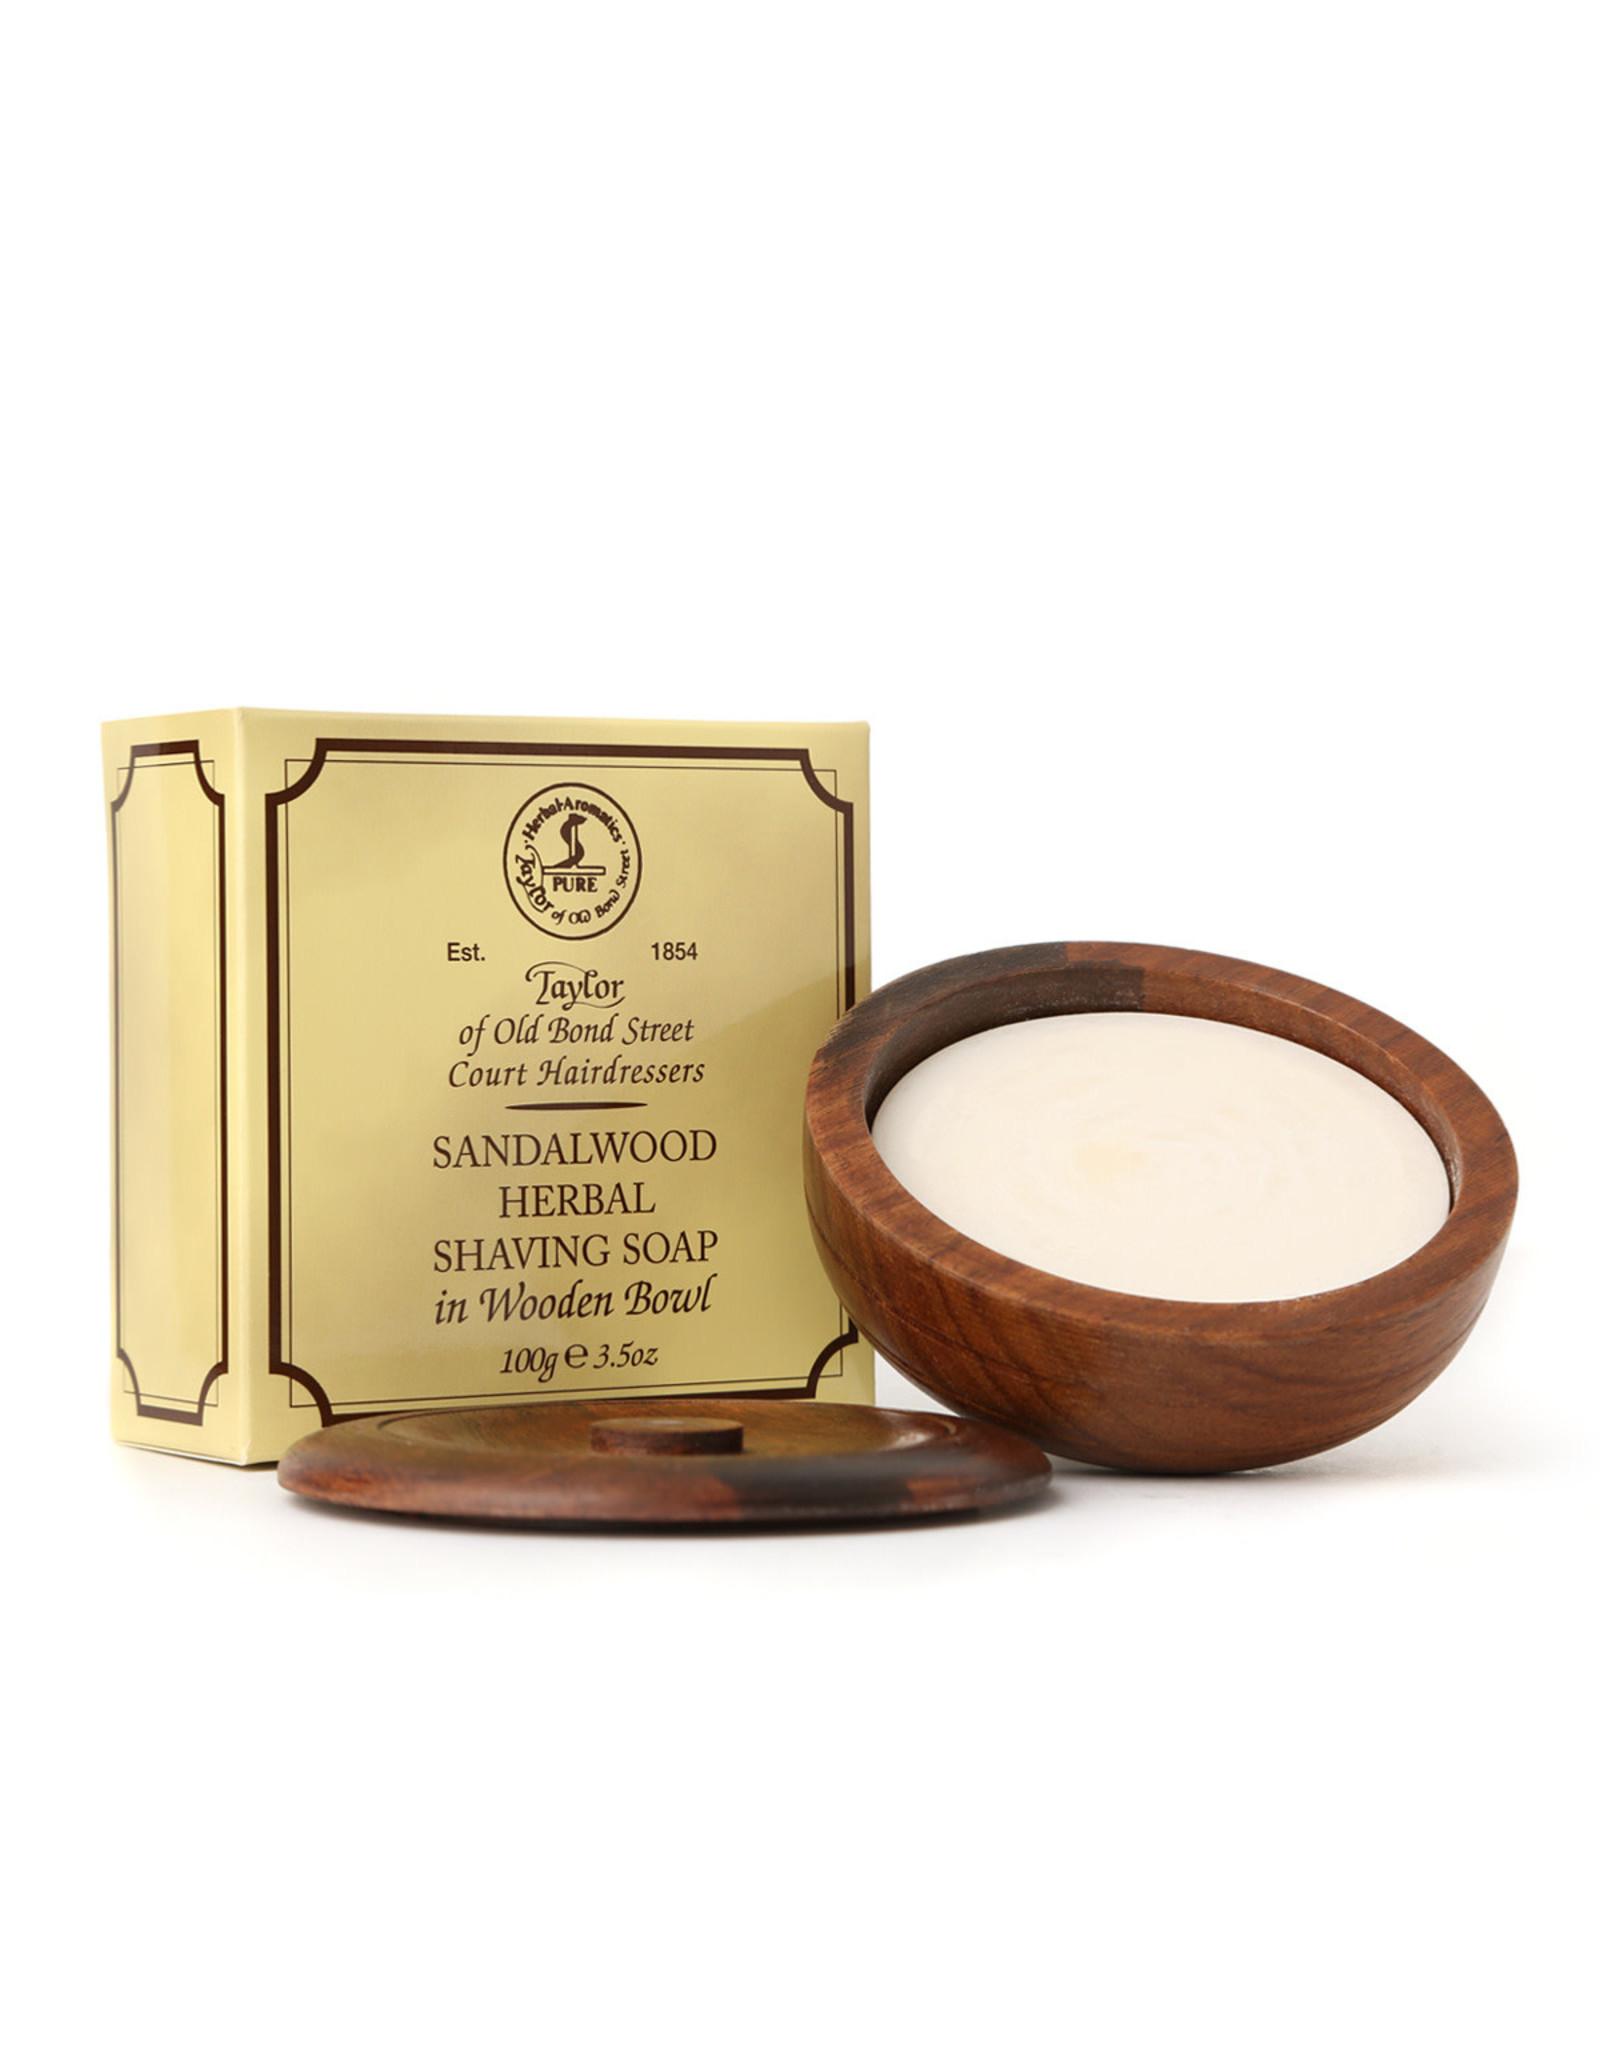 Taylor of Old Bond Street Shaving Soap 100g incl. Wooden Bowl Sandalwood